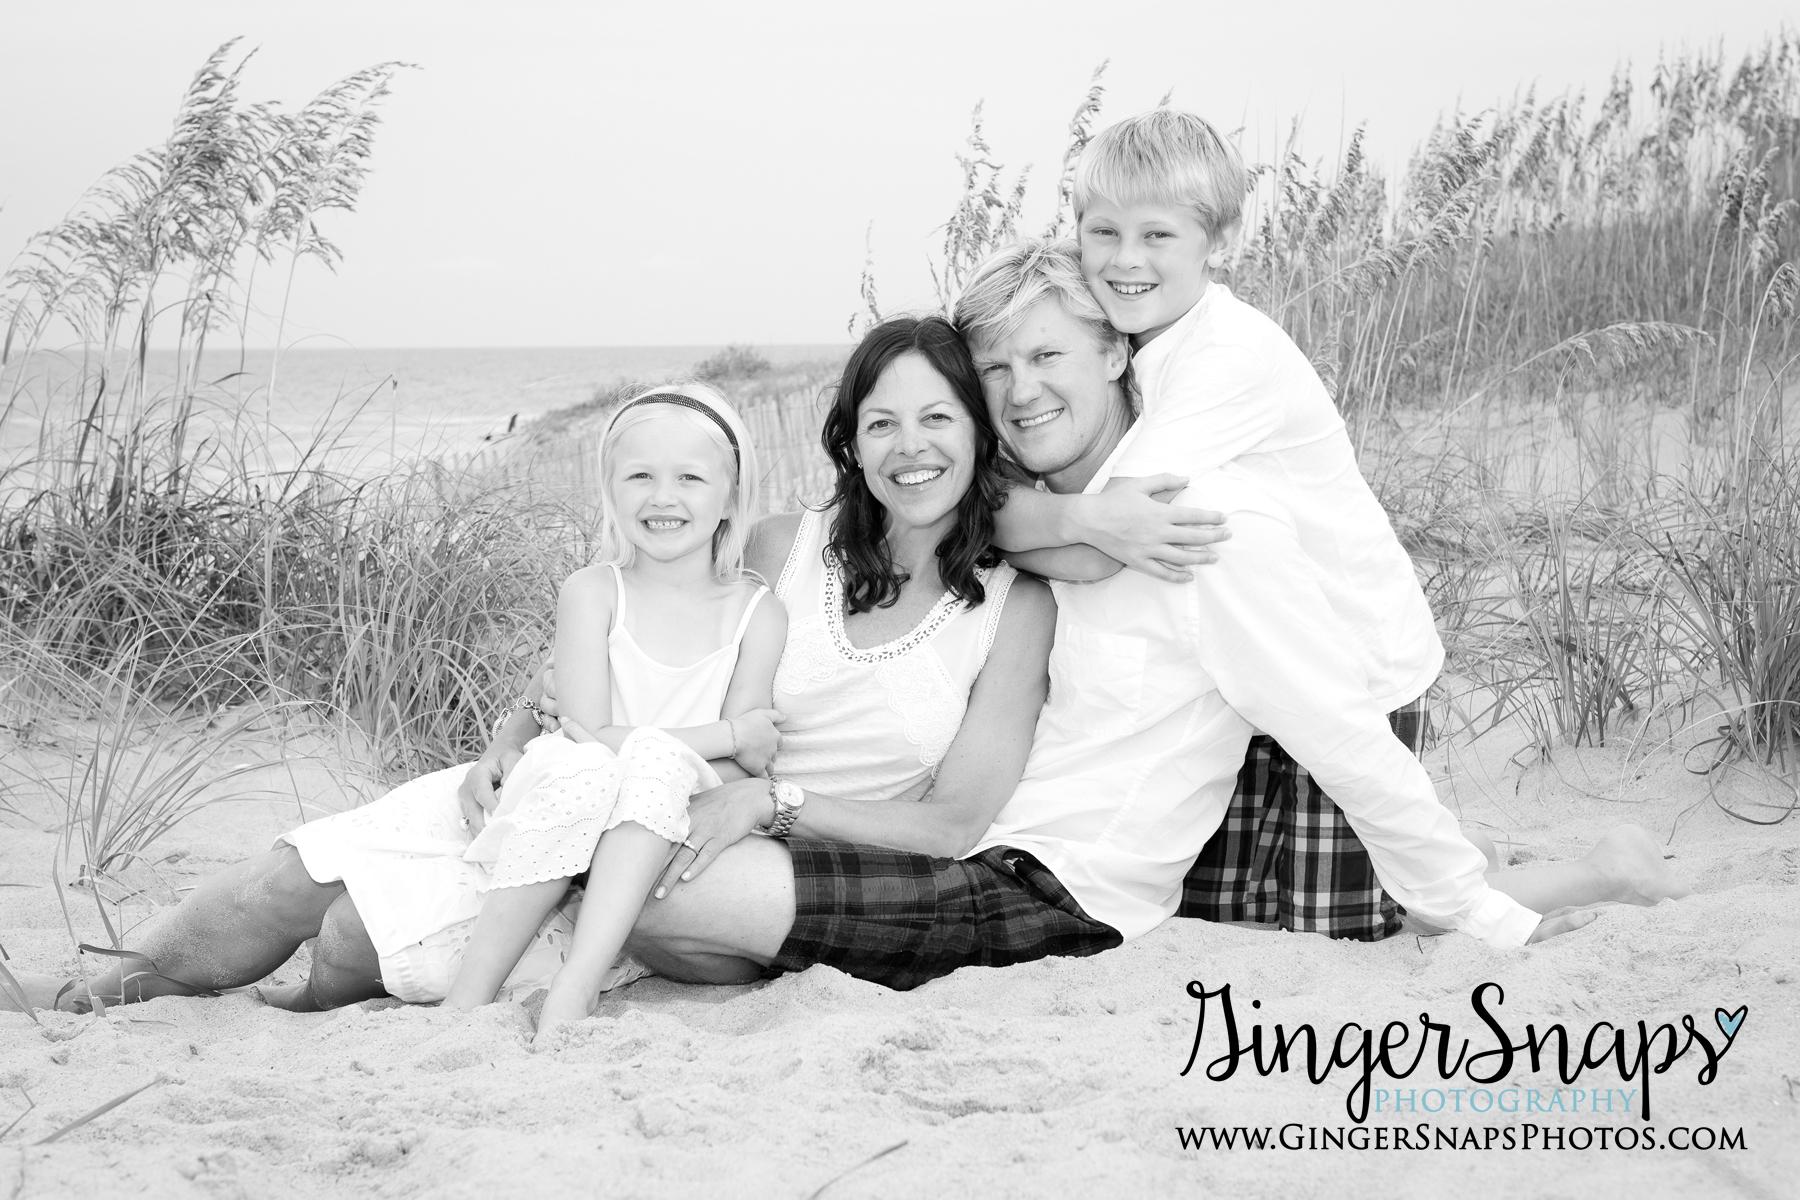 GingerSnaps Photography - 15.jpg